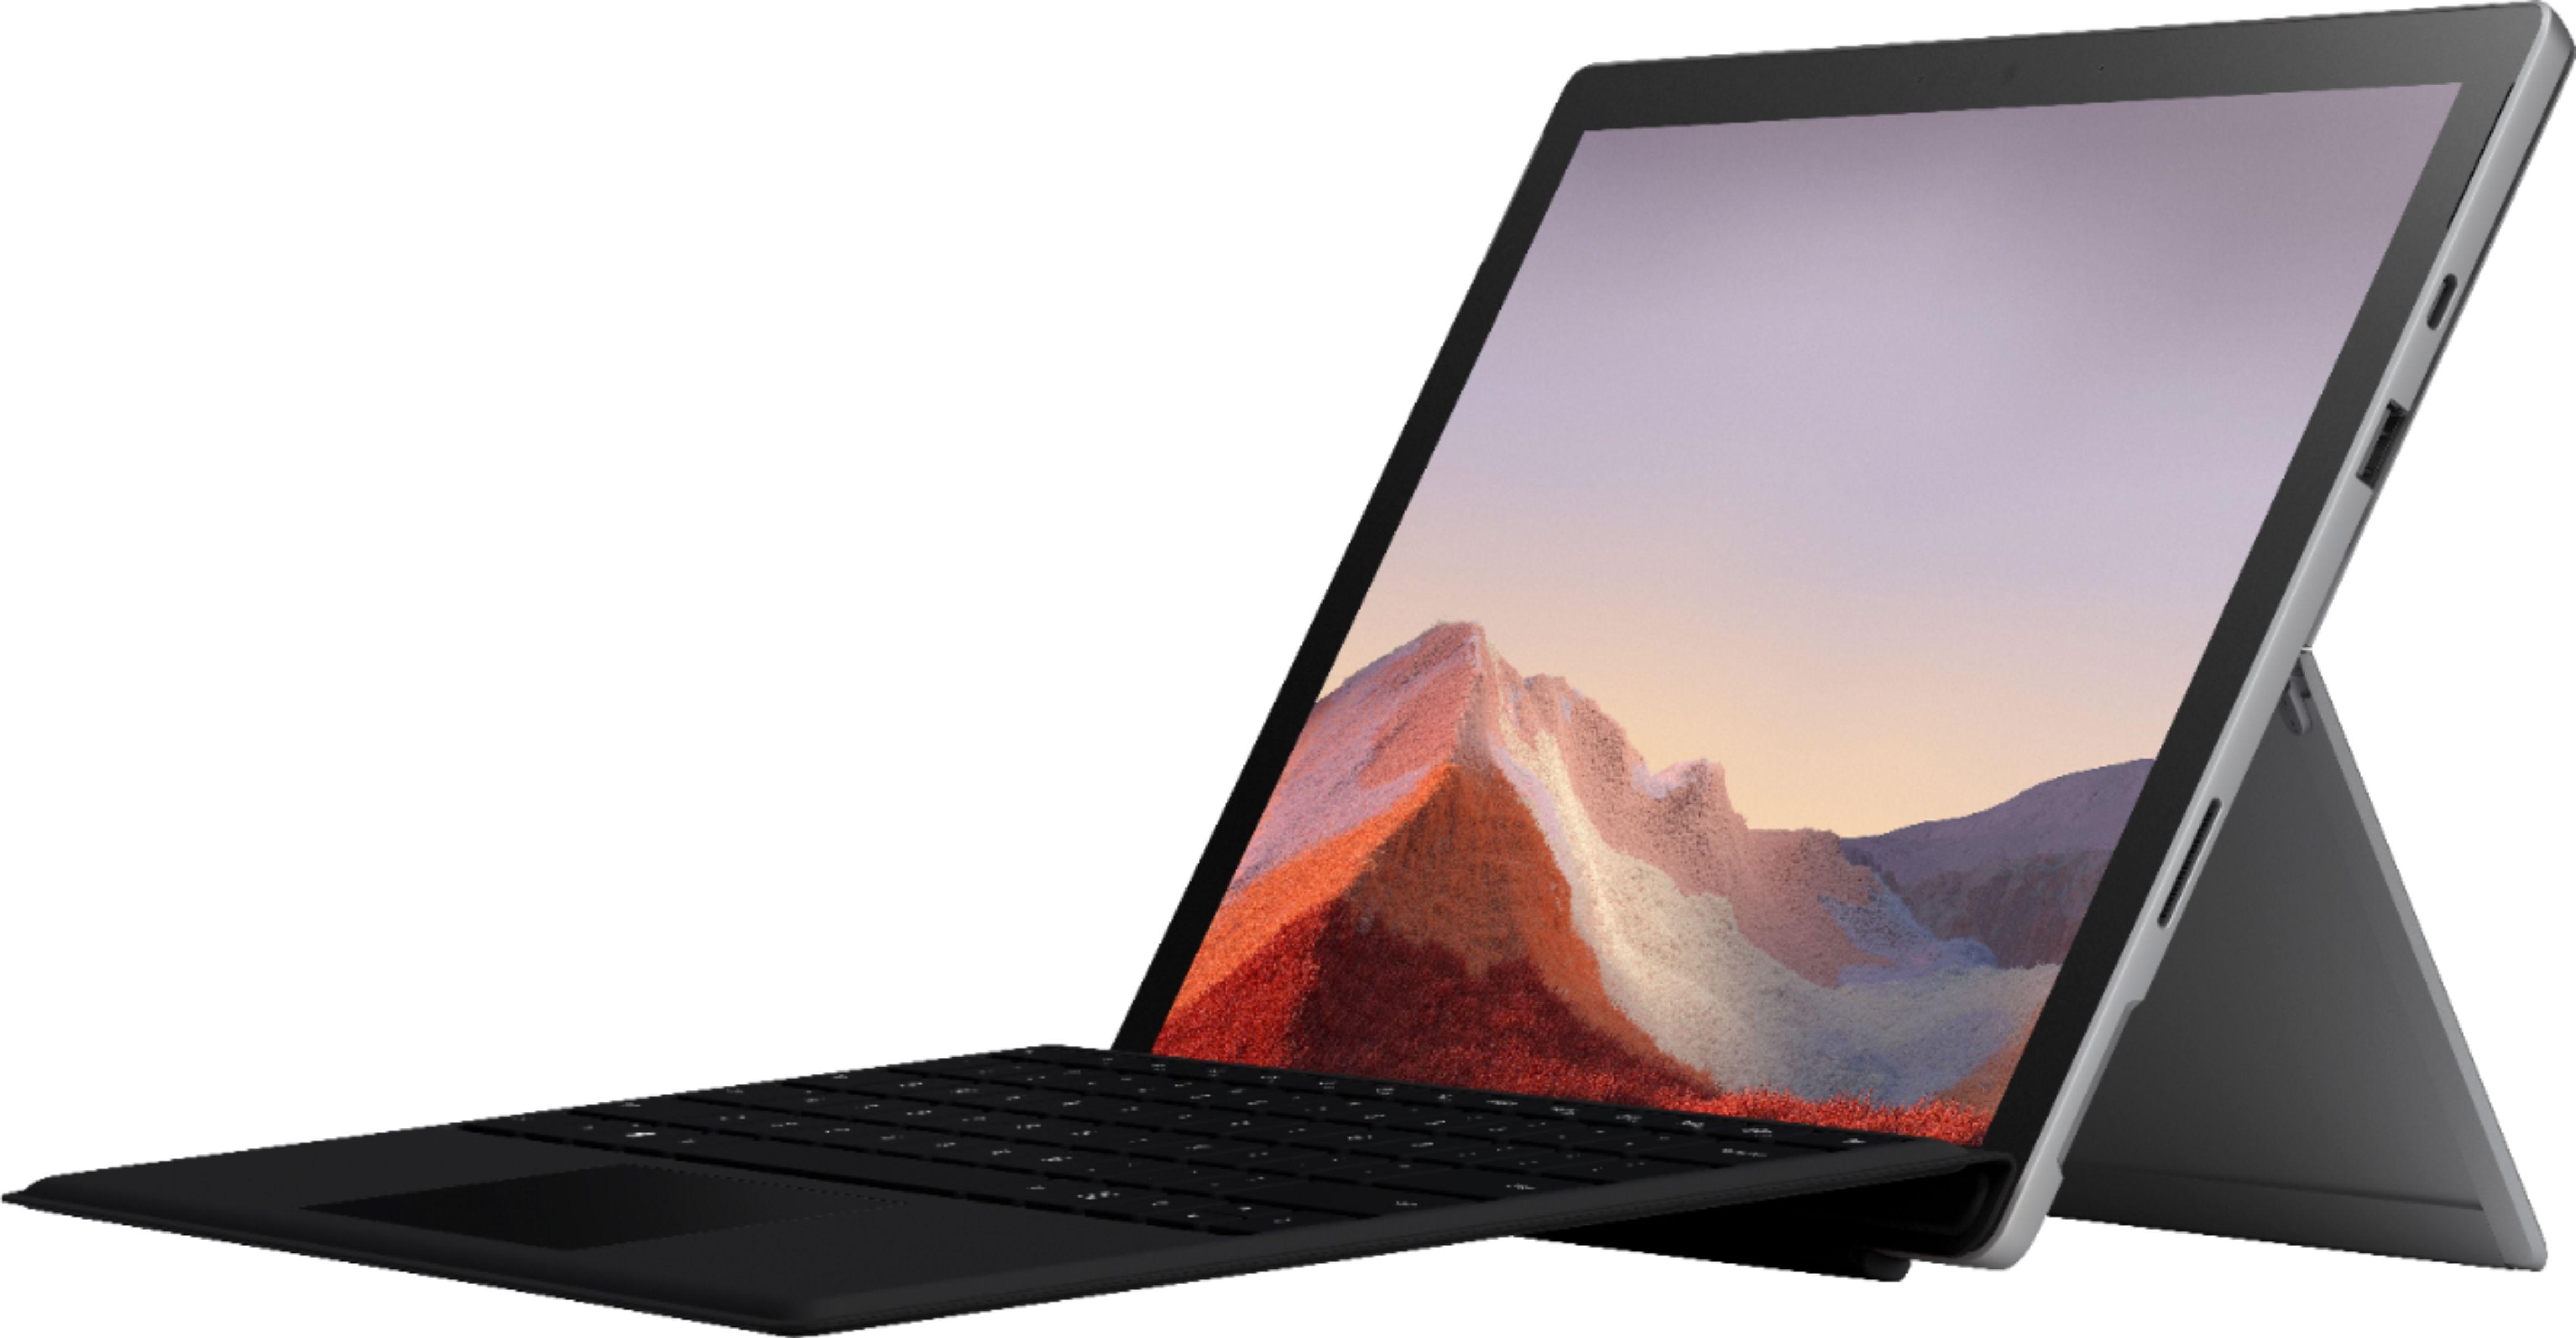 Best Buy - Surface Pro 7 i3 4GB RAM 128GB SSD W/ TypeCover (no Pen) - $599